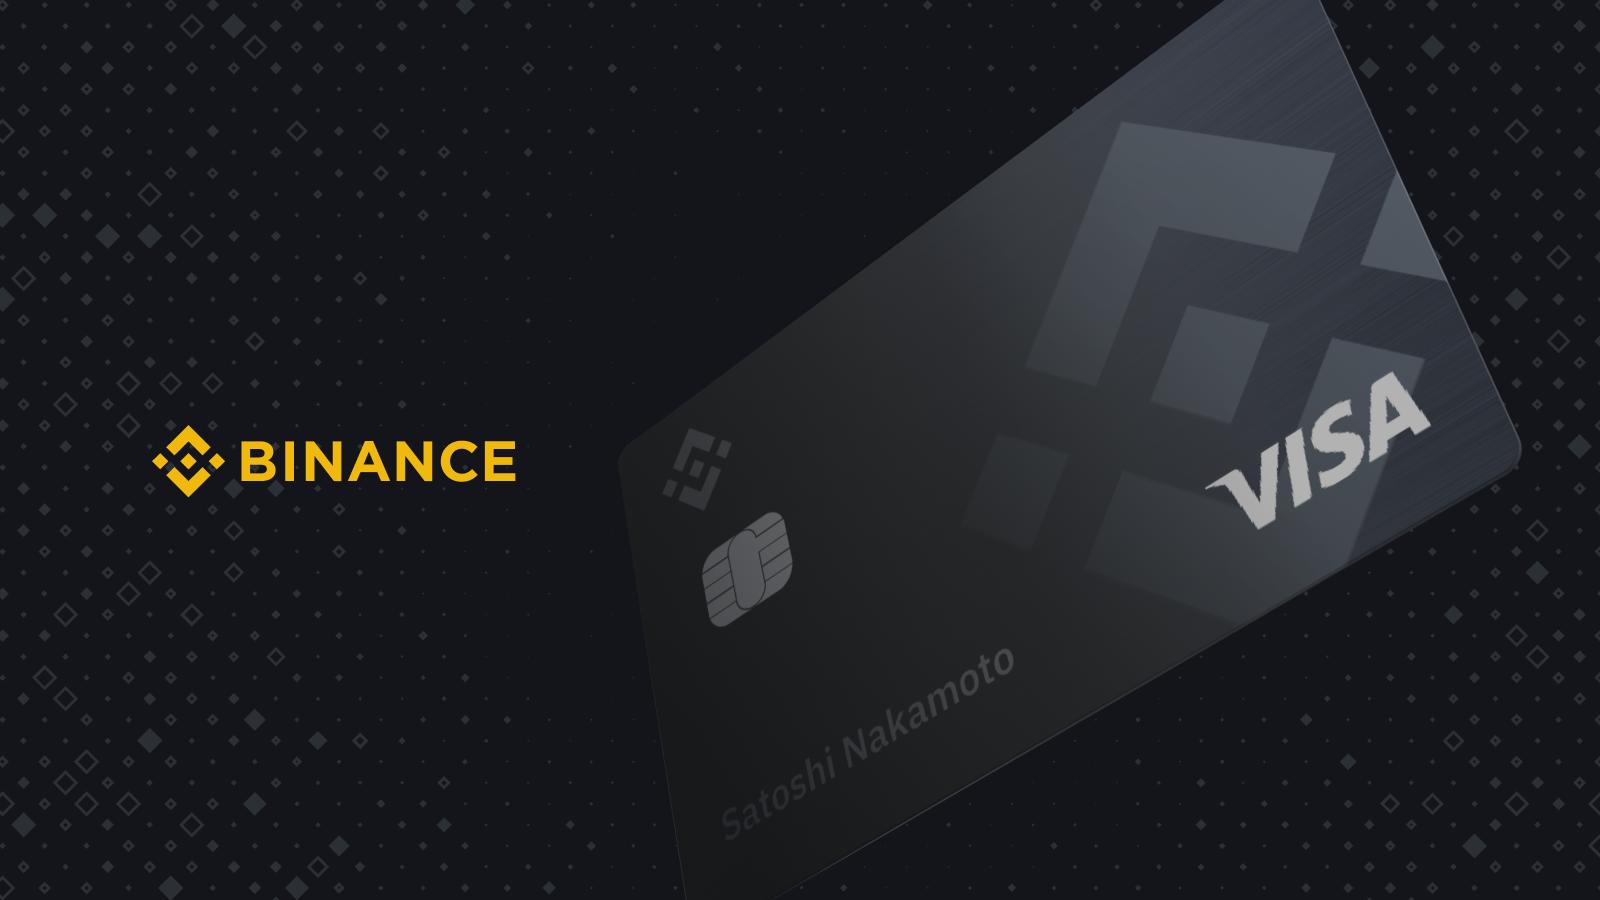 картой Visa от Binance